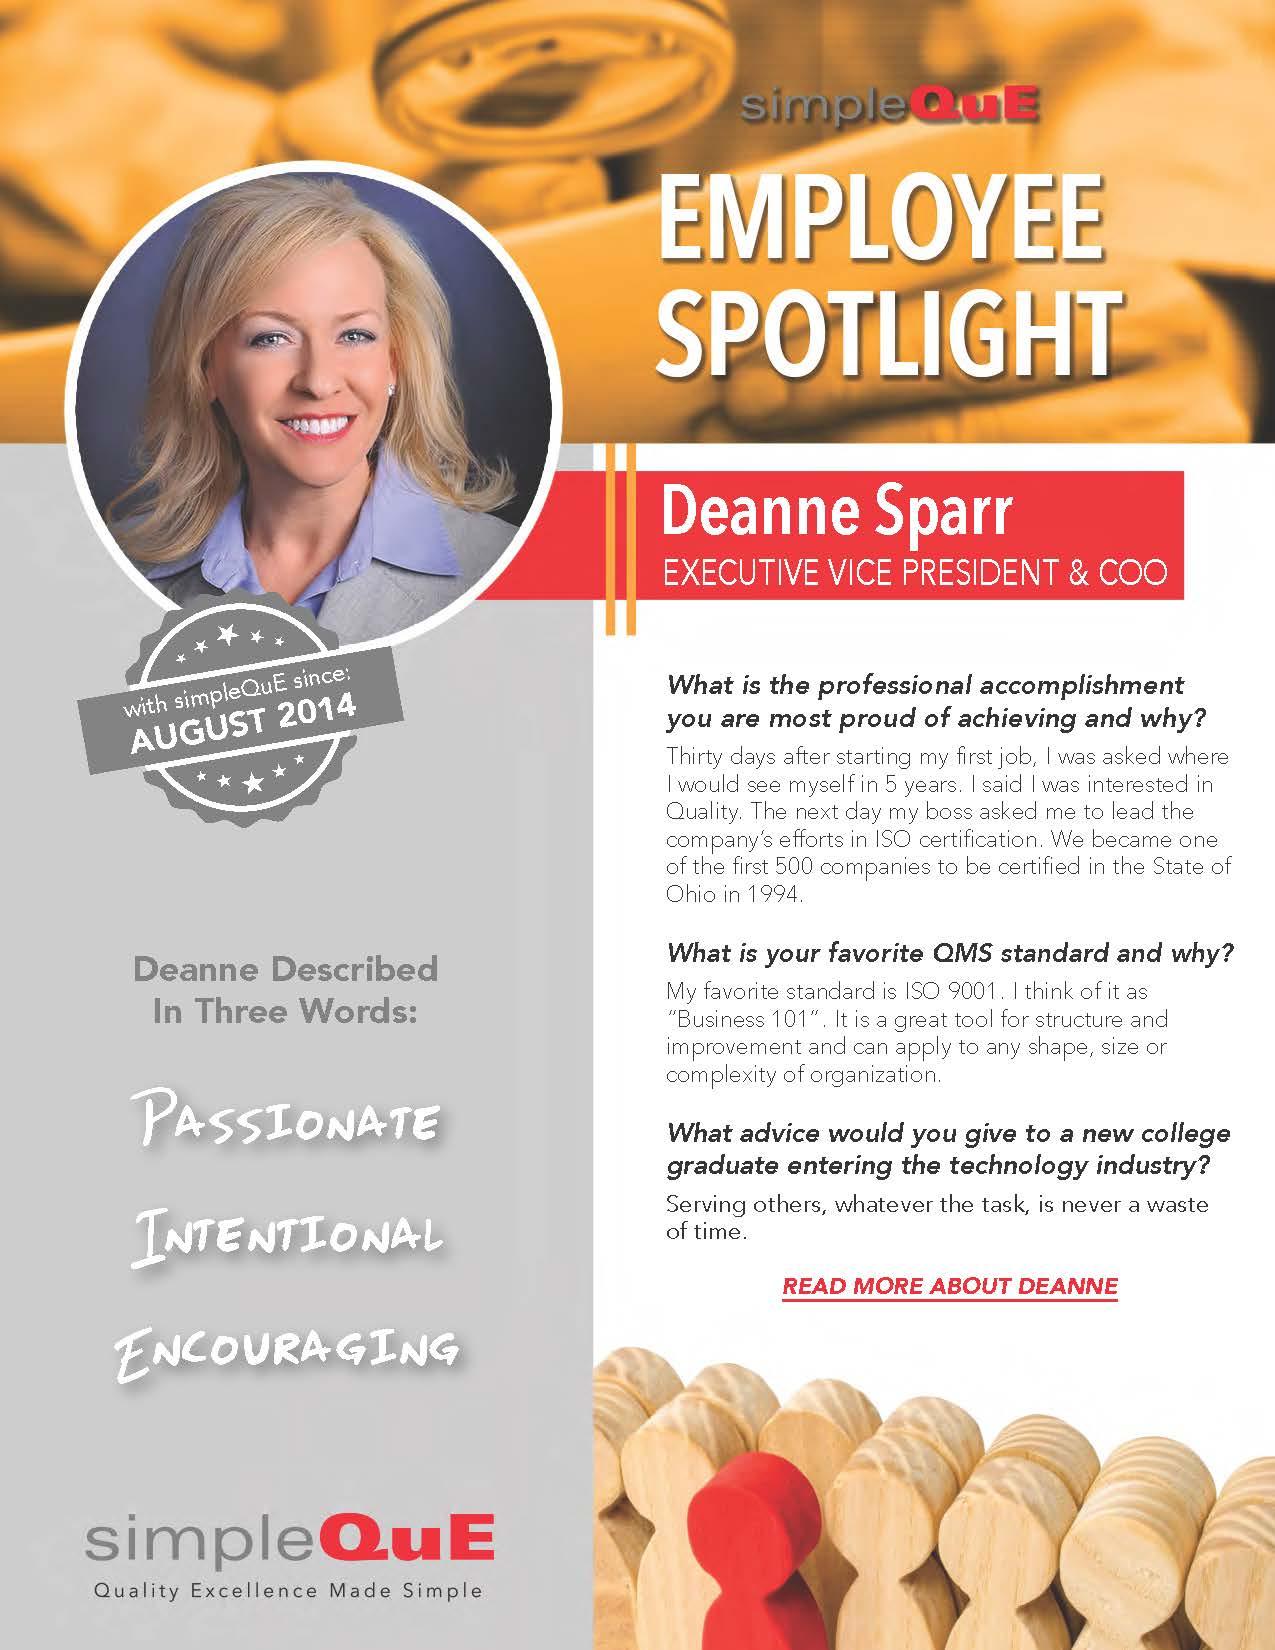 Employee Spotlight Deanne Sparr